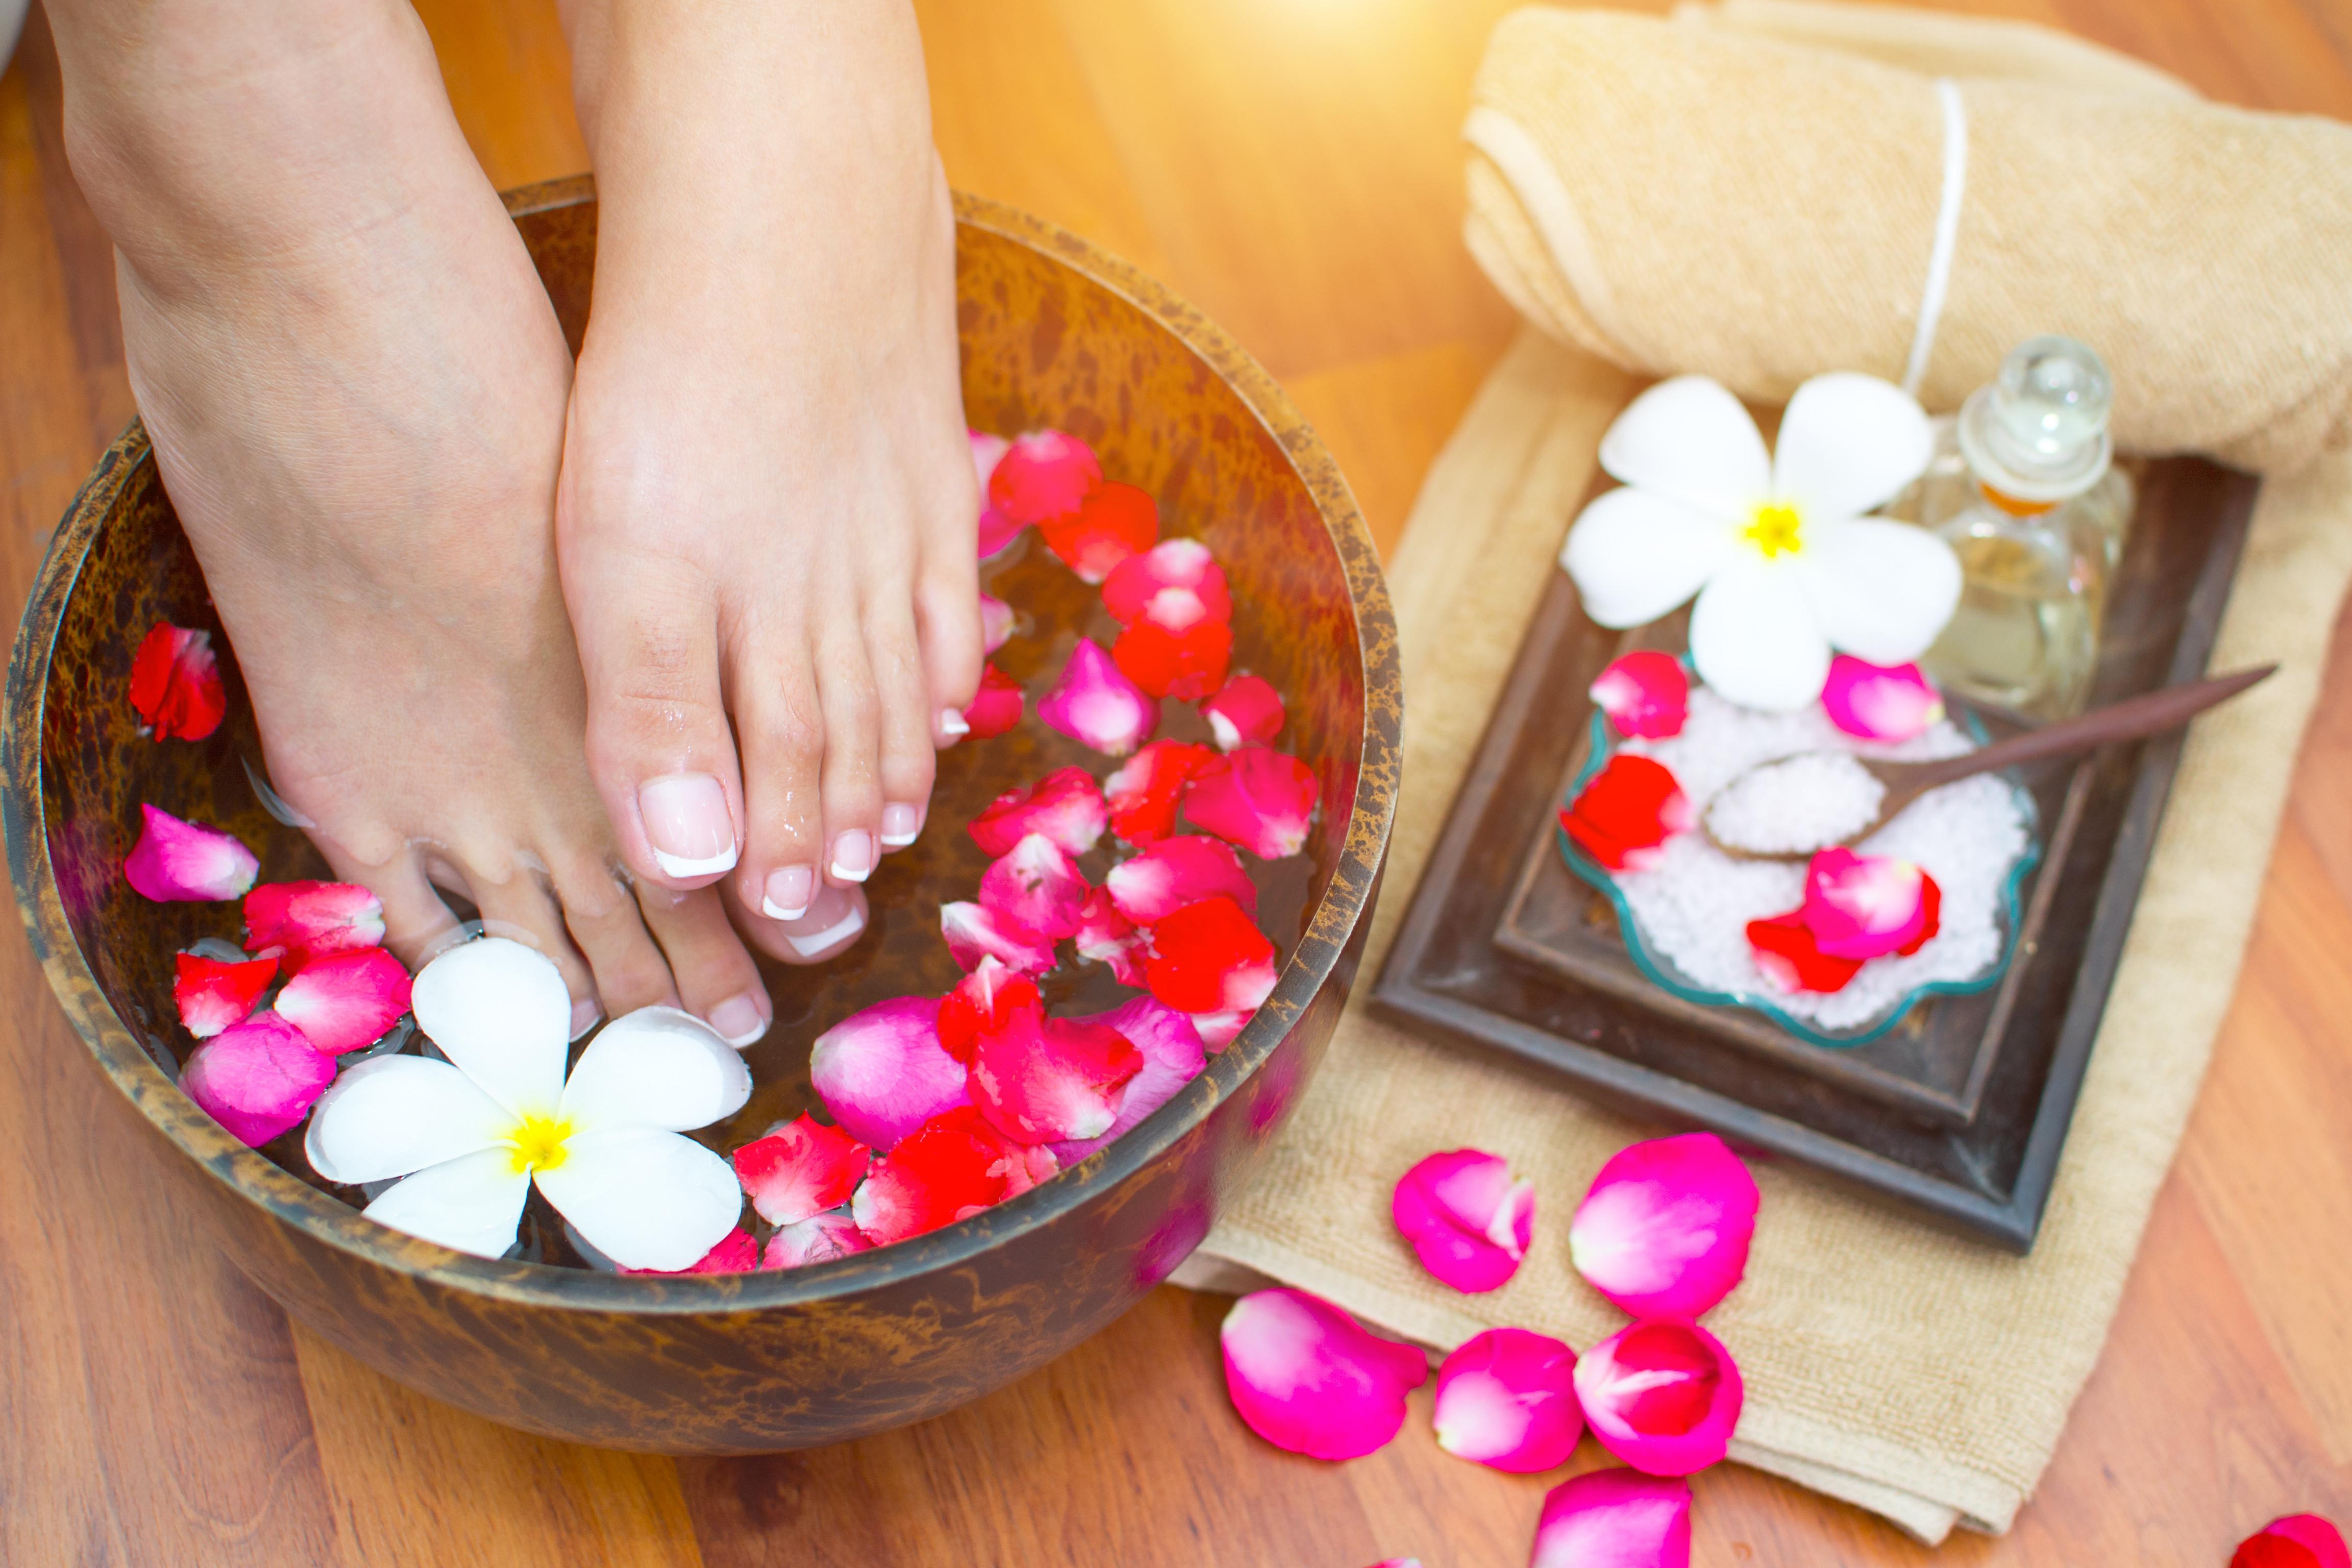 Signature Massage Peppermint Foot Scrub